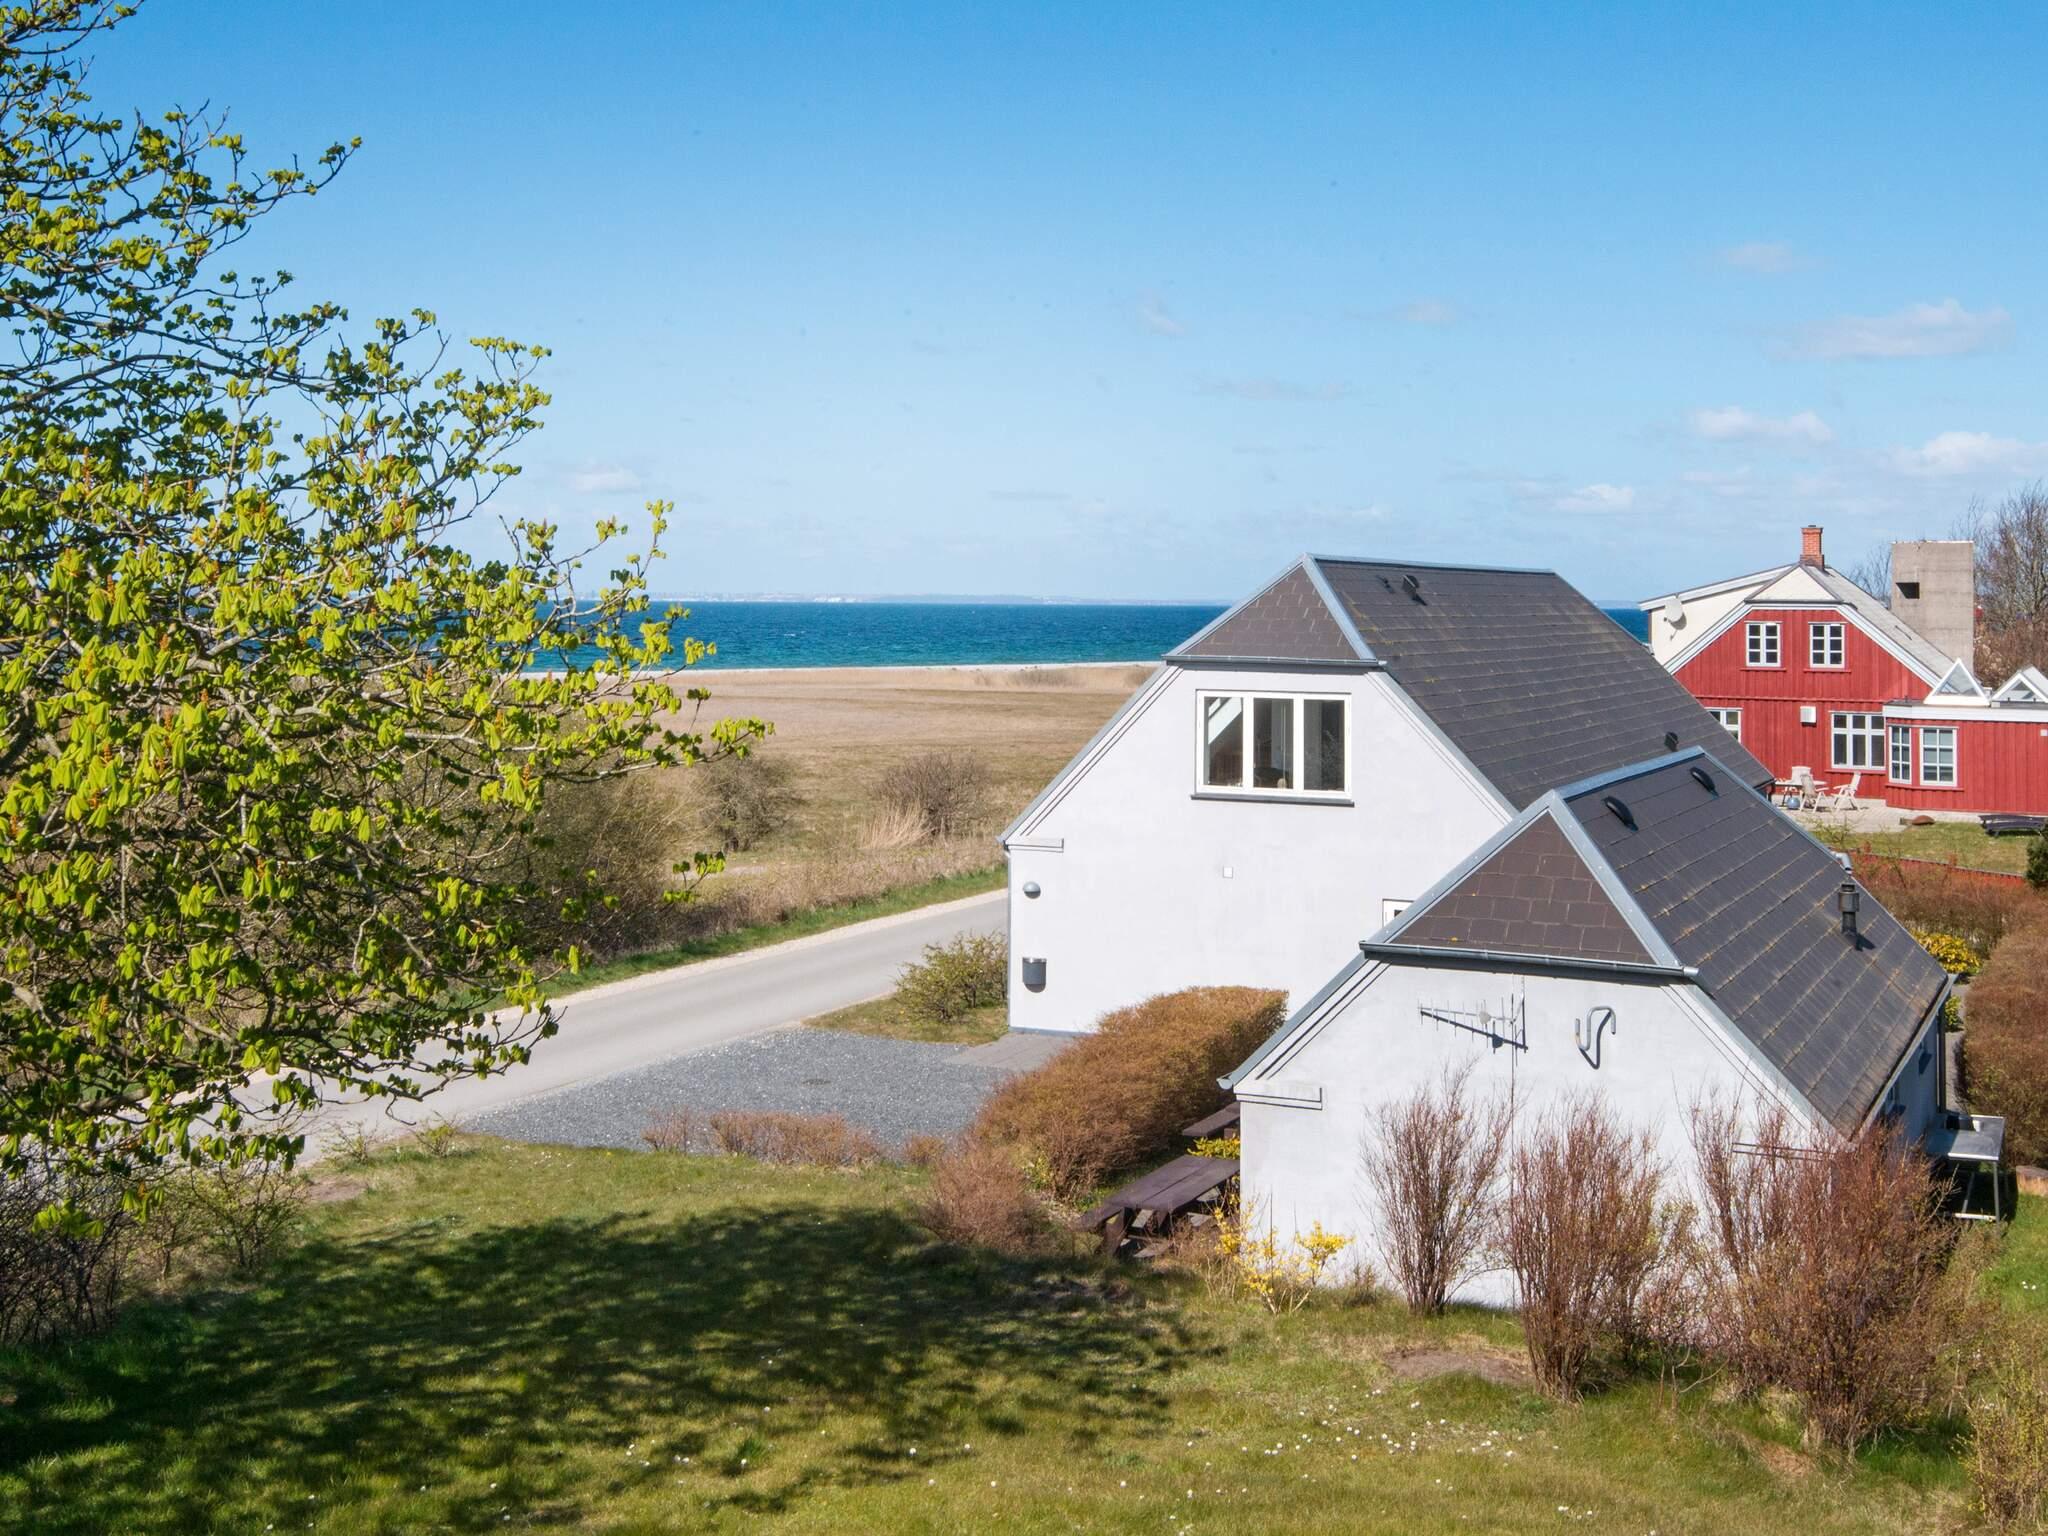 Maison de vacances Helgenæs (590964), Knebel, , Mer Baltique danoise, Danemark, image 1